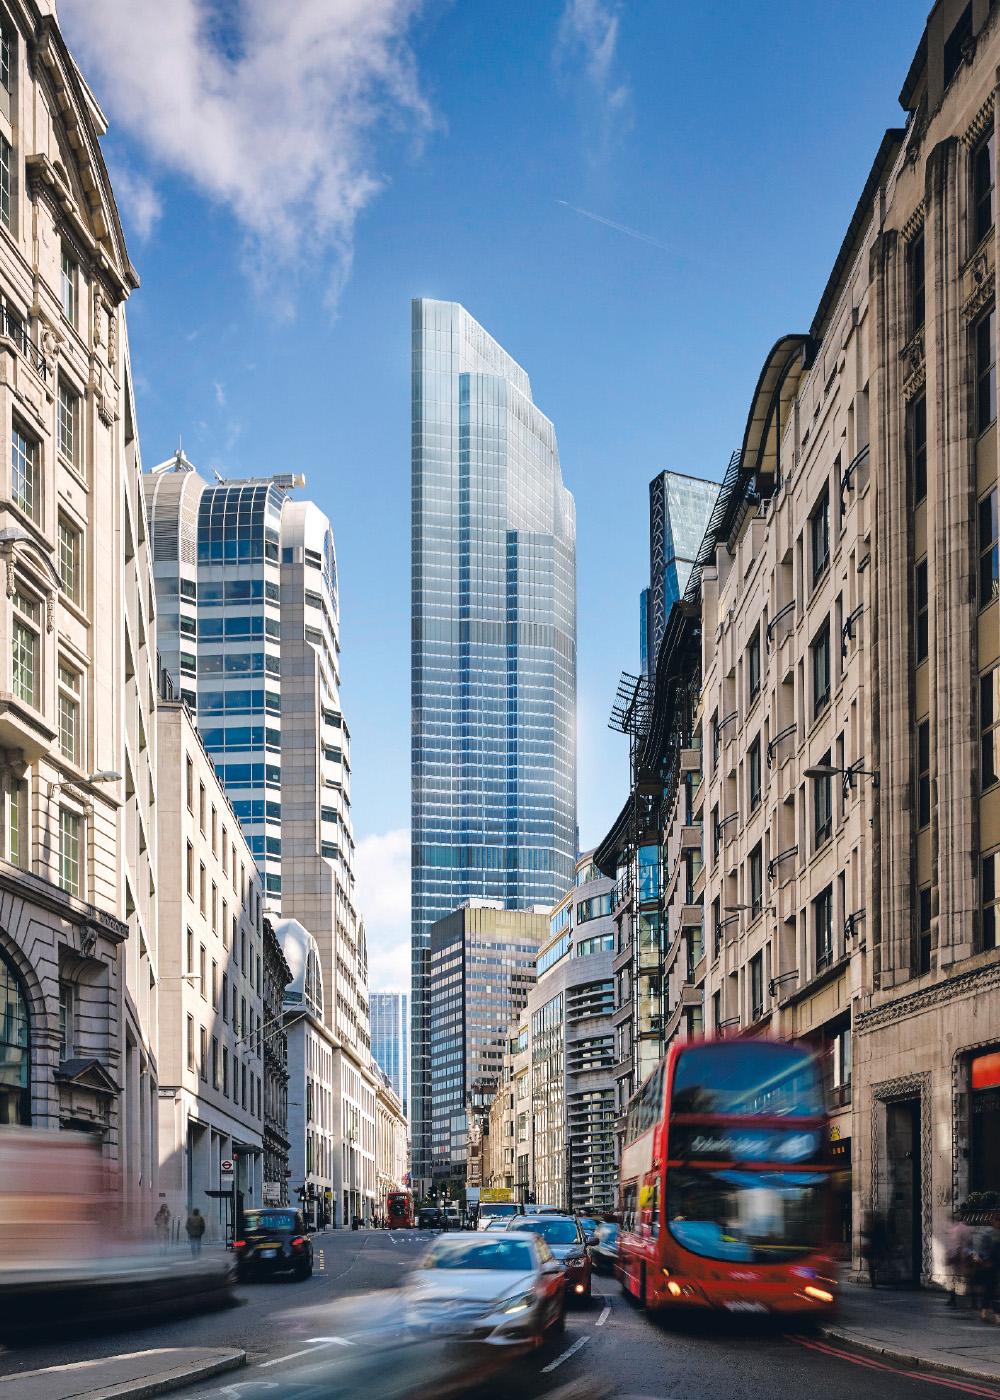 Street scene of London featuring 22 Bishopsgate